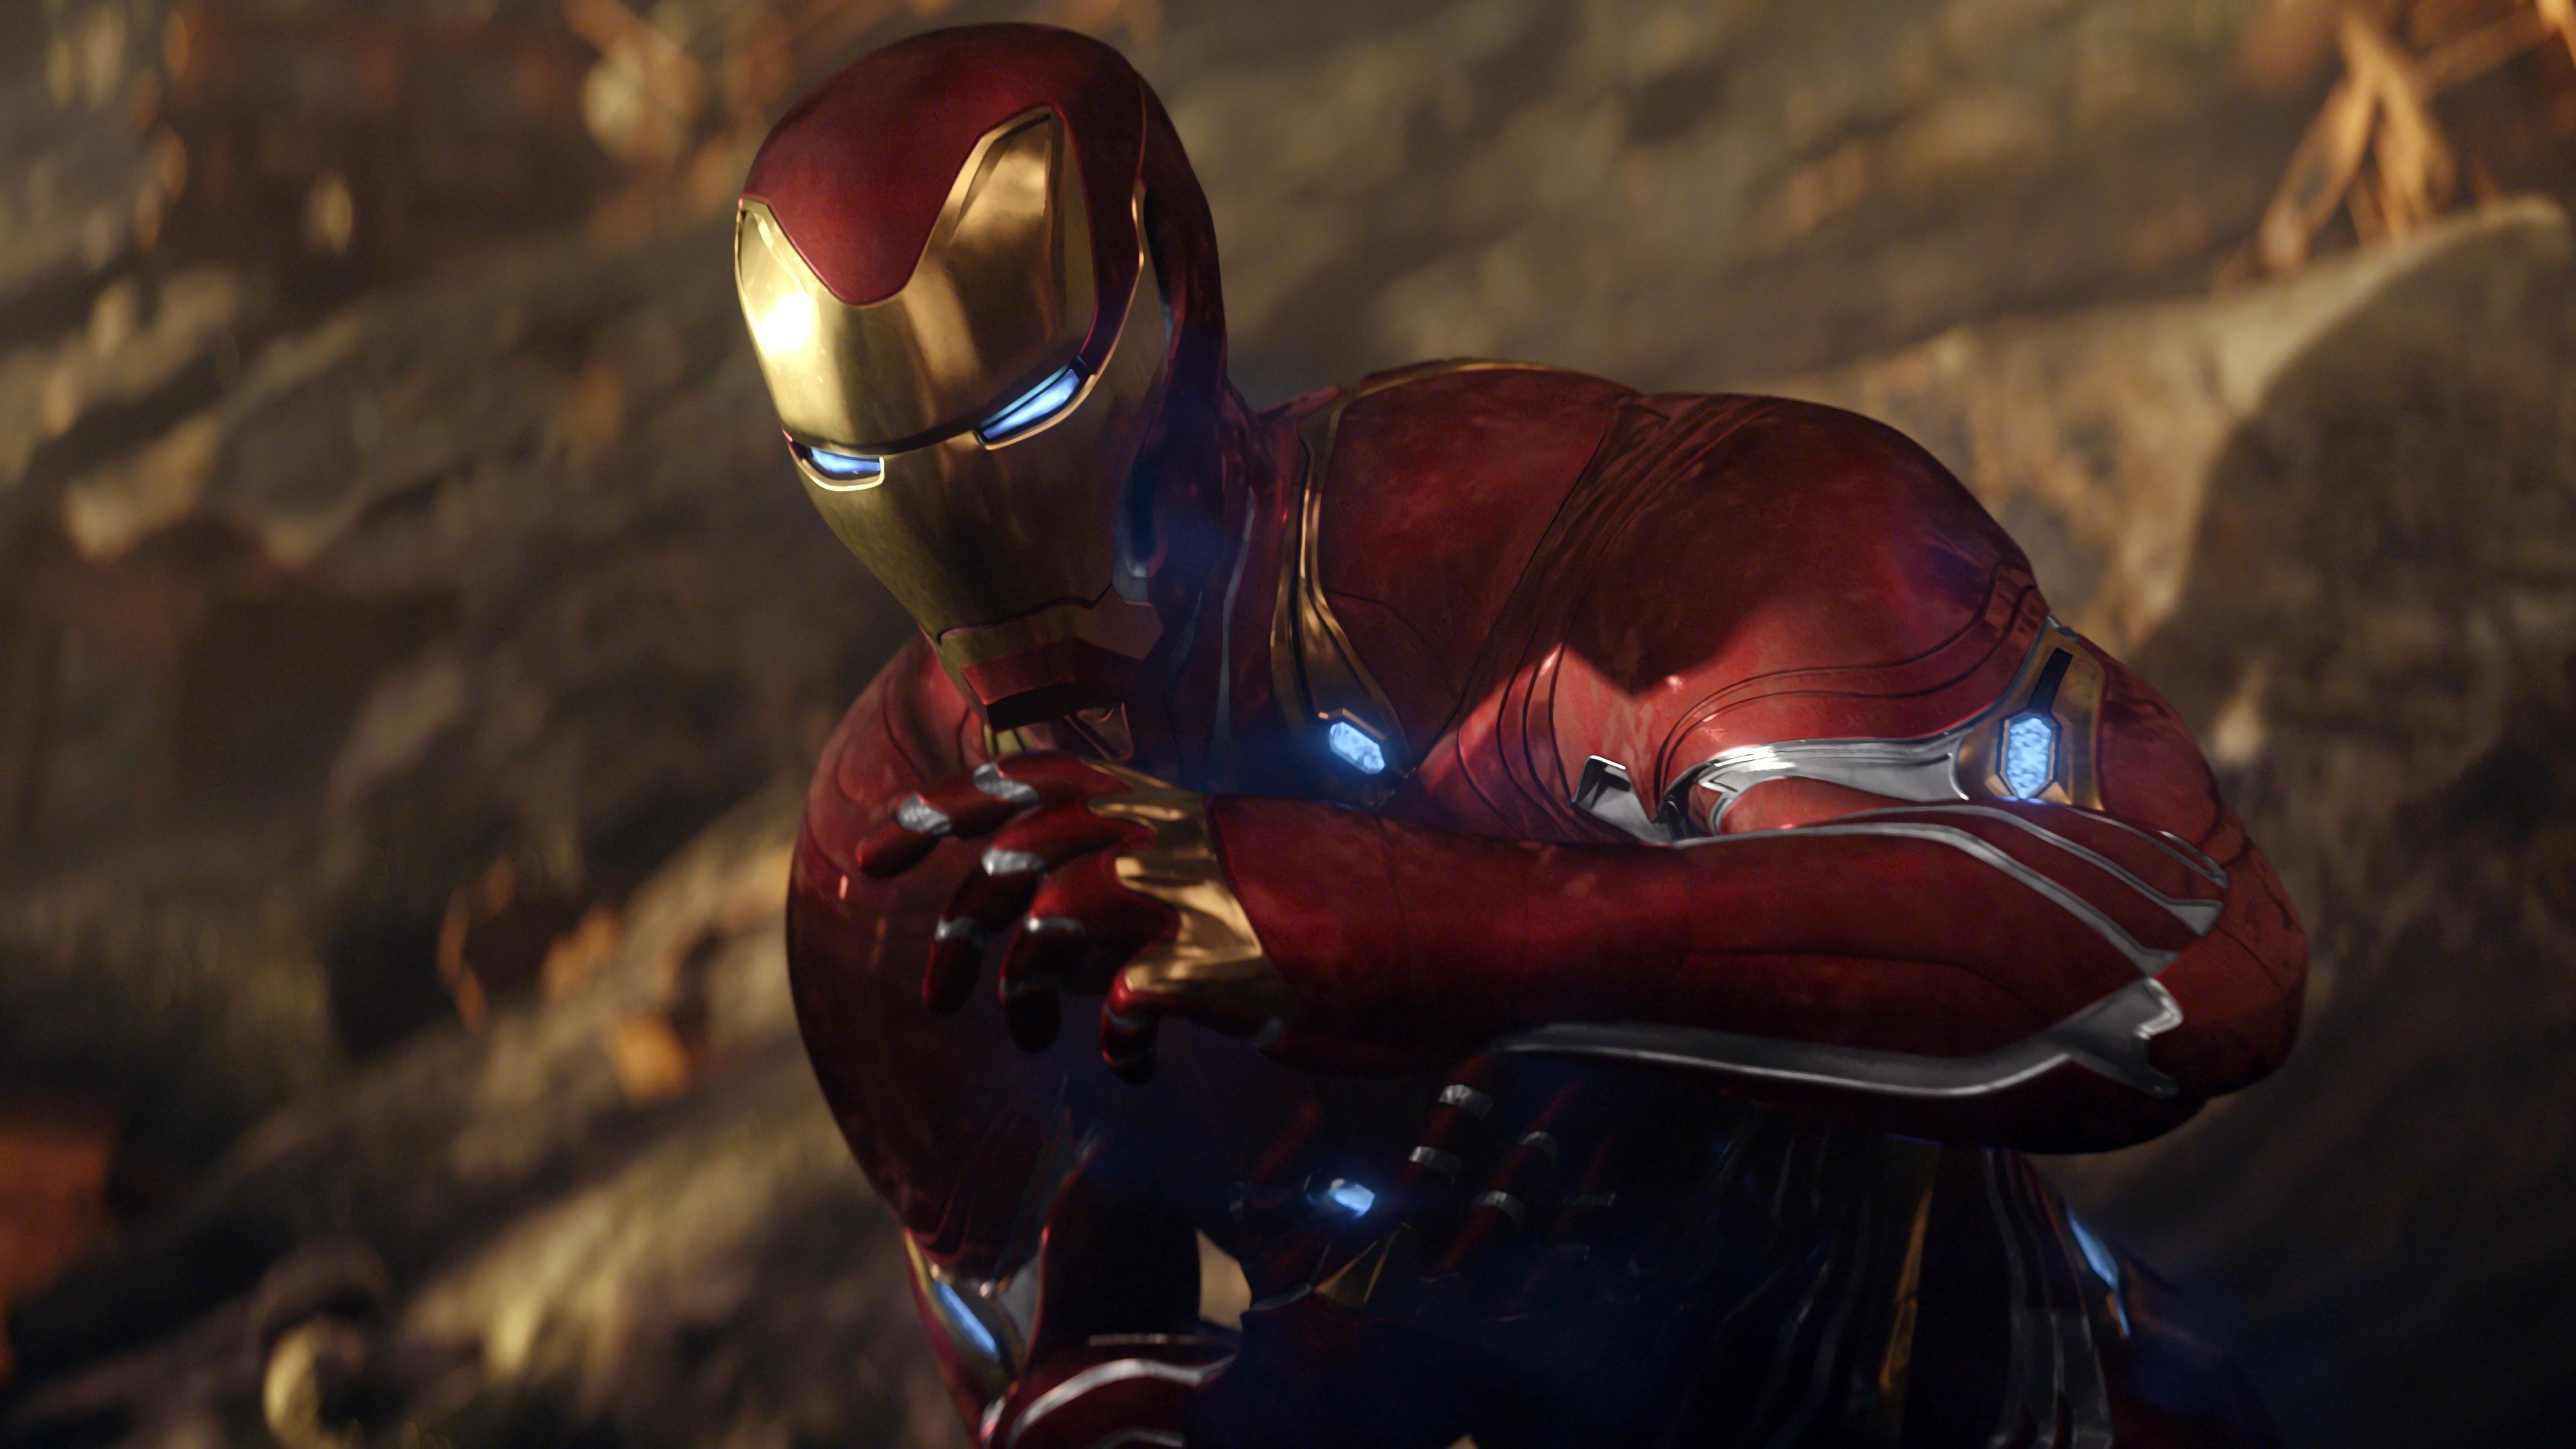 Avengers Infinity War Iron Man Marvel 4k